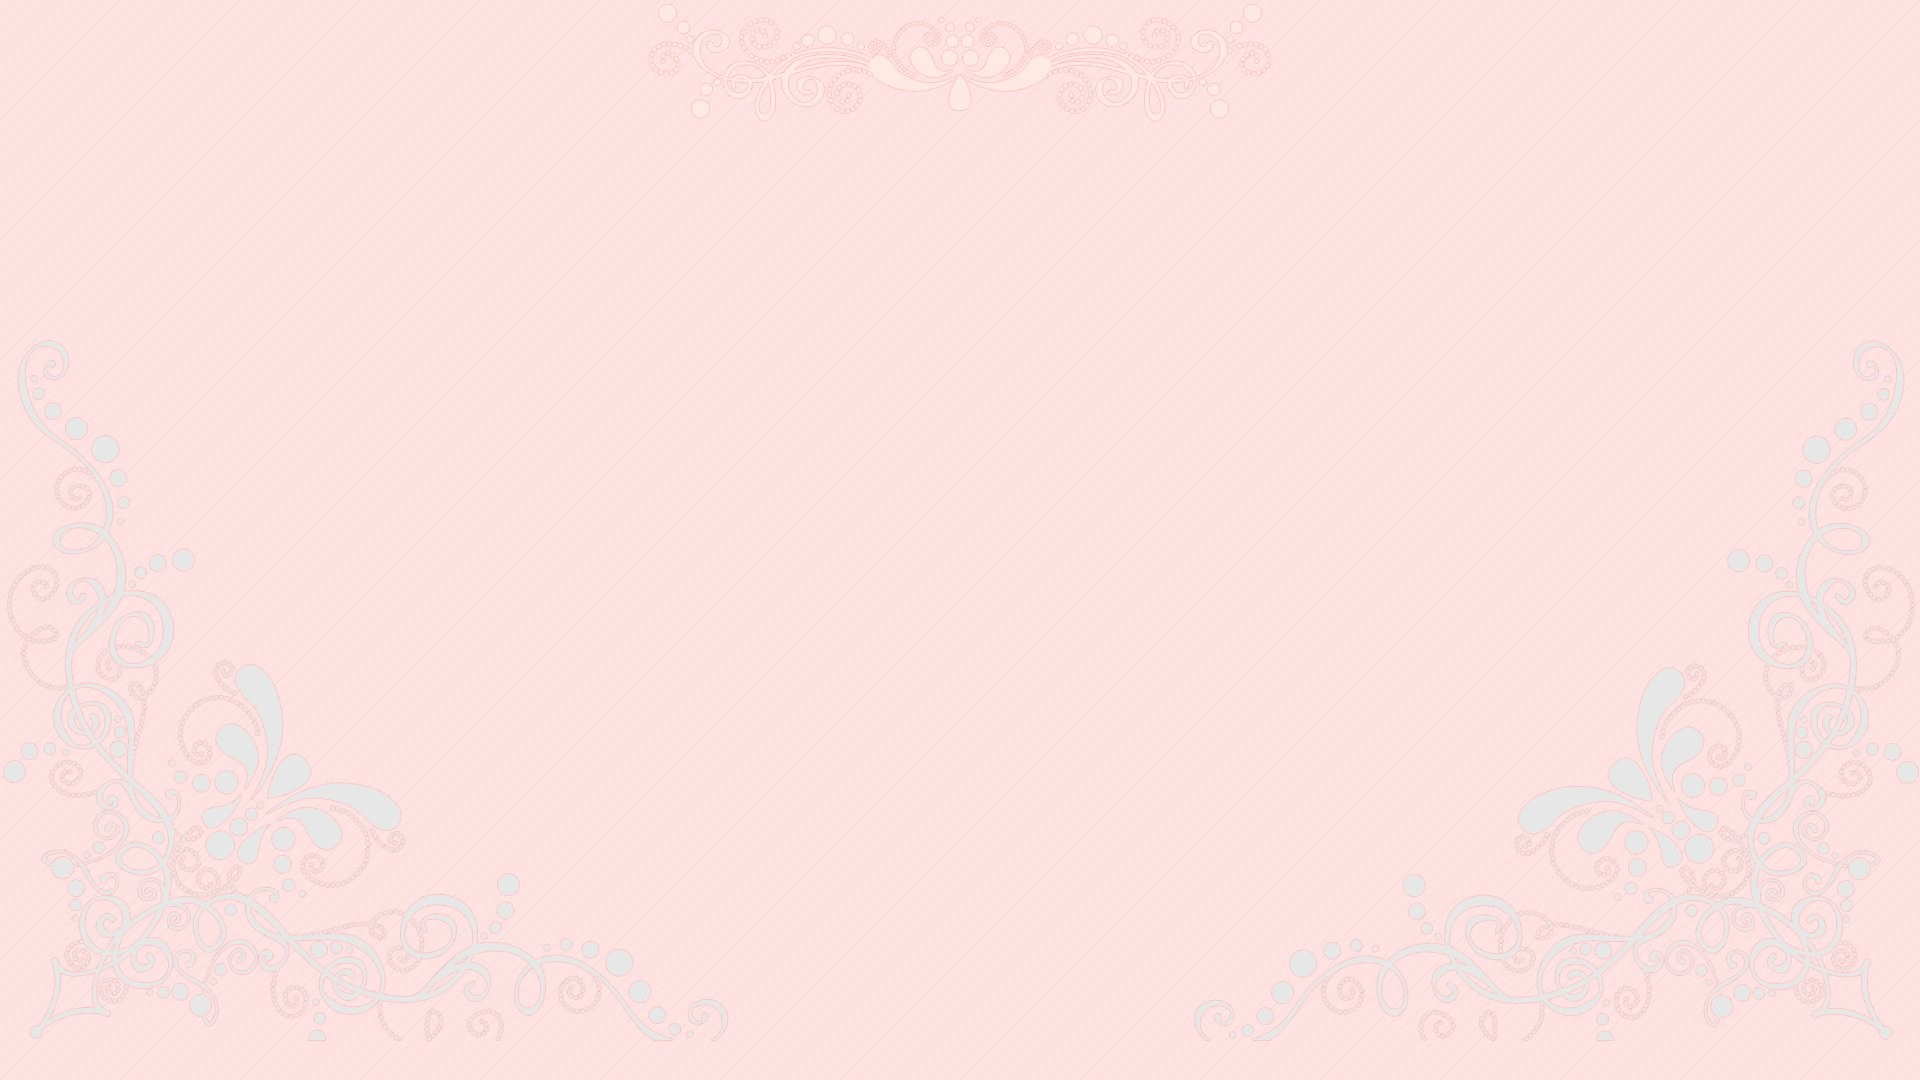 Pastel Pink background ·① Download free cool HD ...